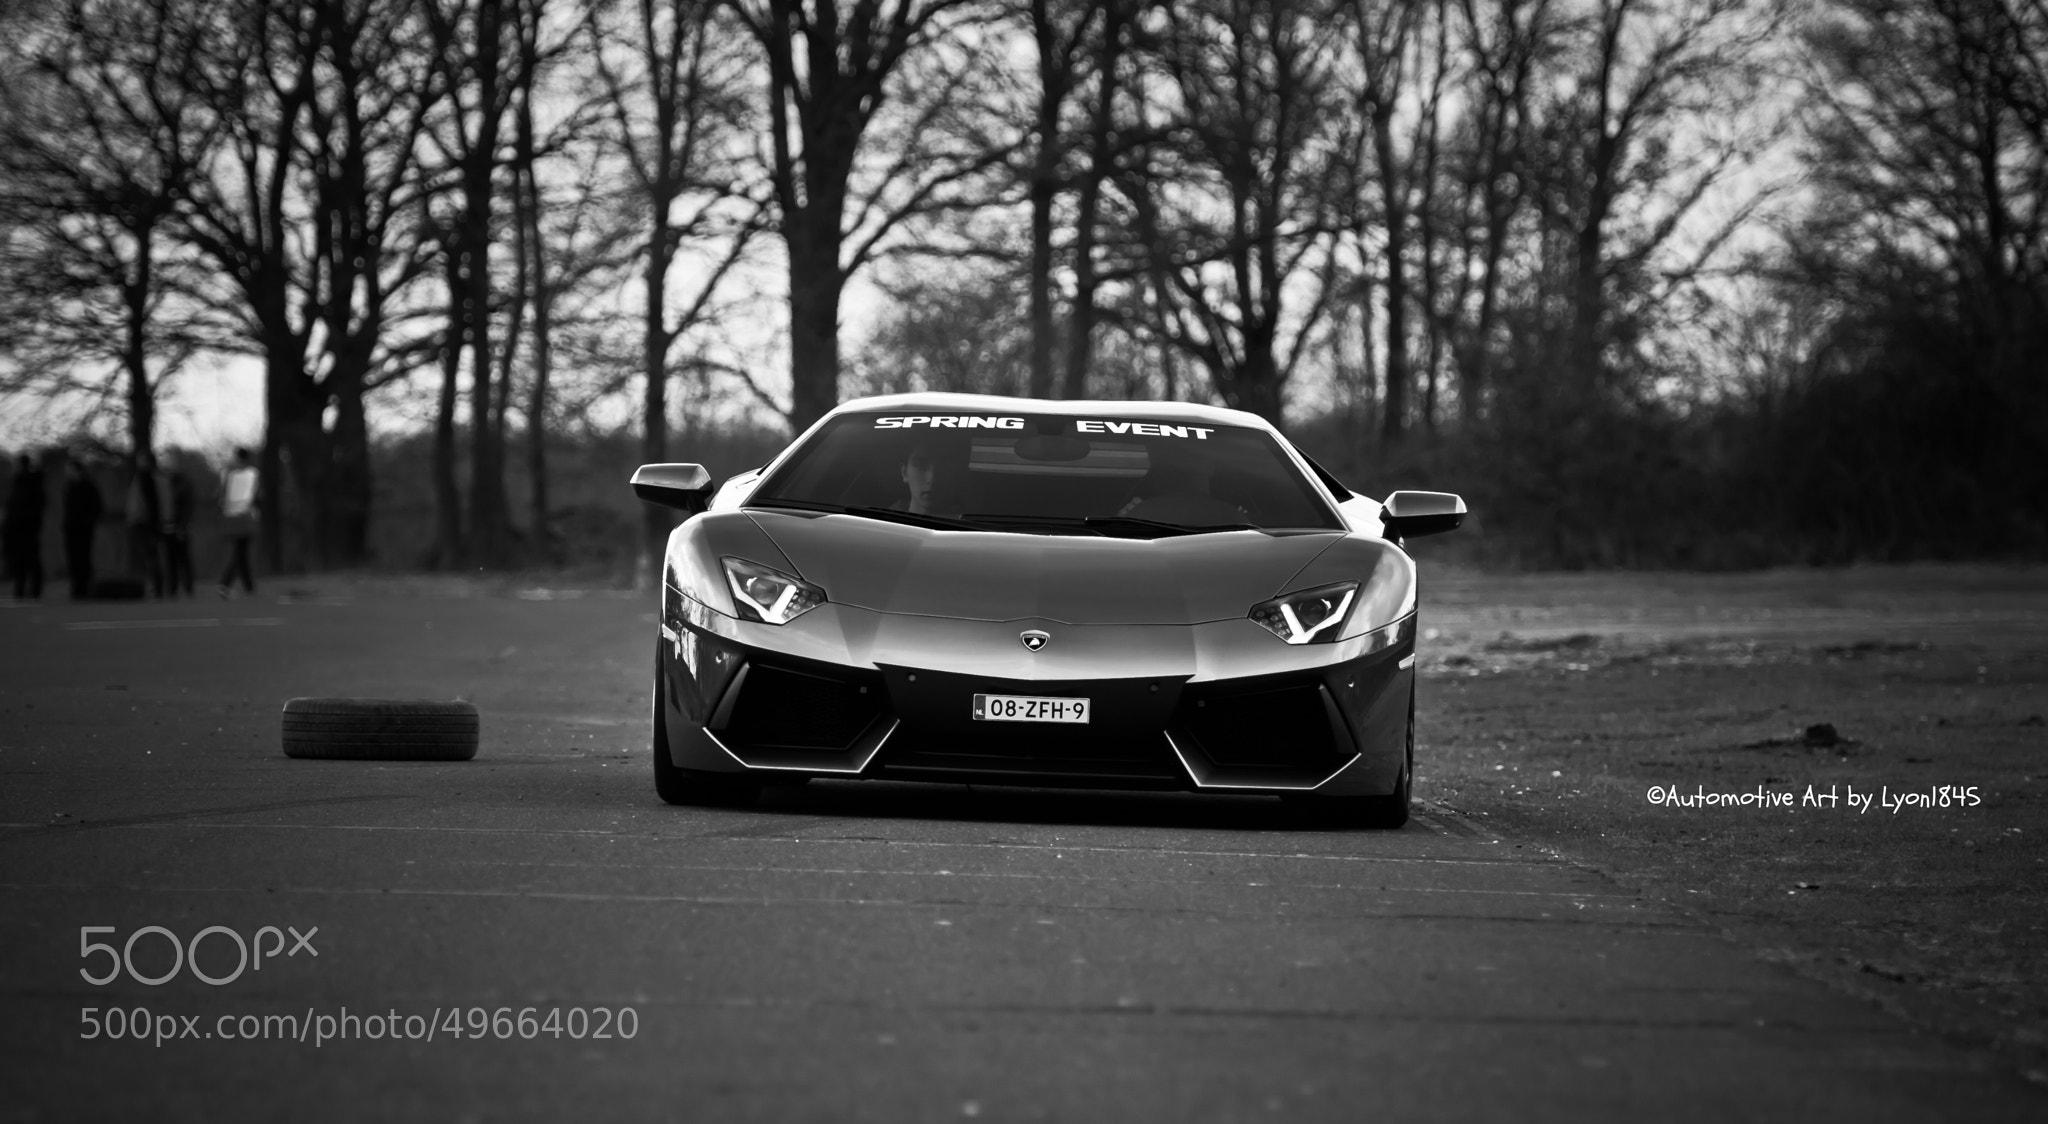 Photograph Lamborghini Aventador by lyon1845 on 500px